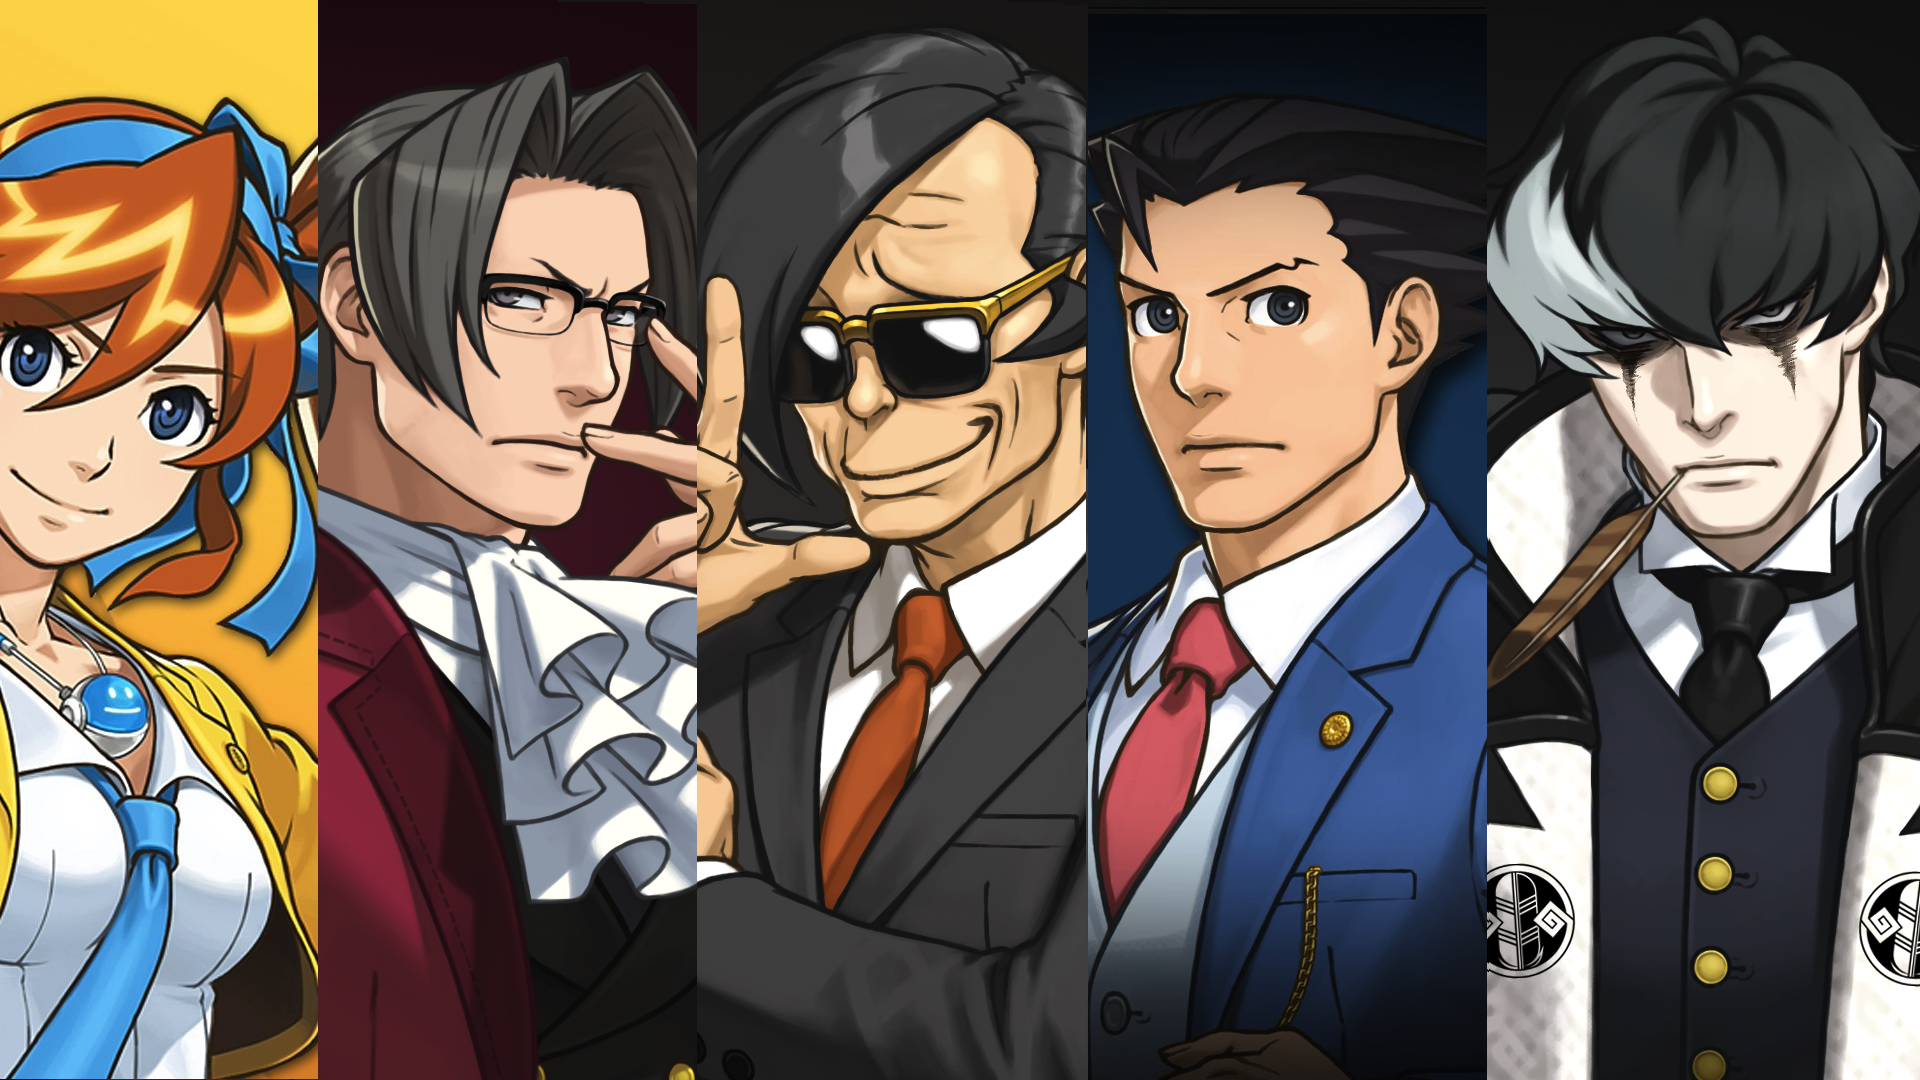 4) Phoenix Wright: Ace Attorney - Dual Destinies